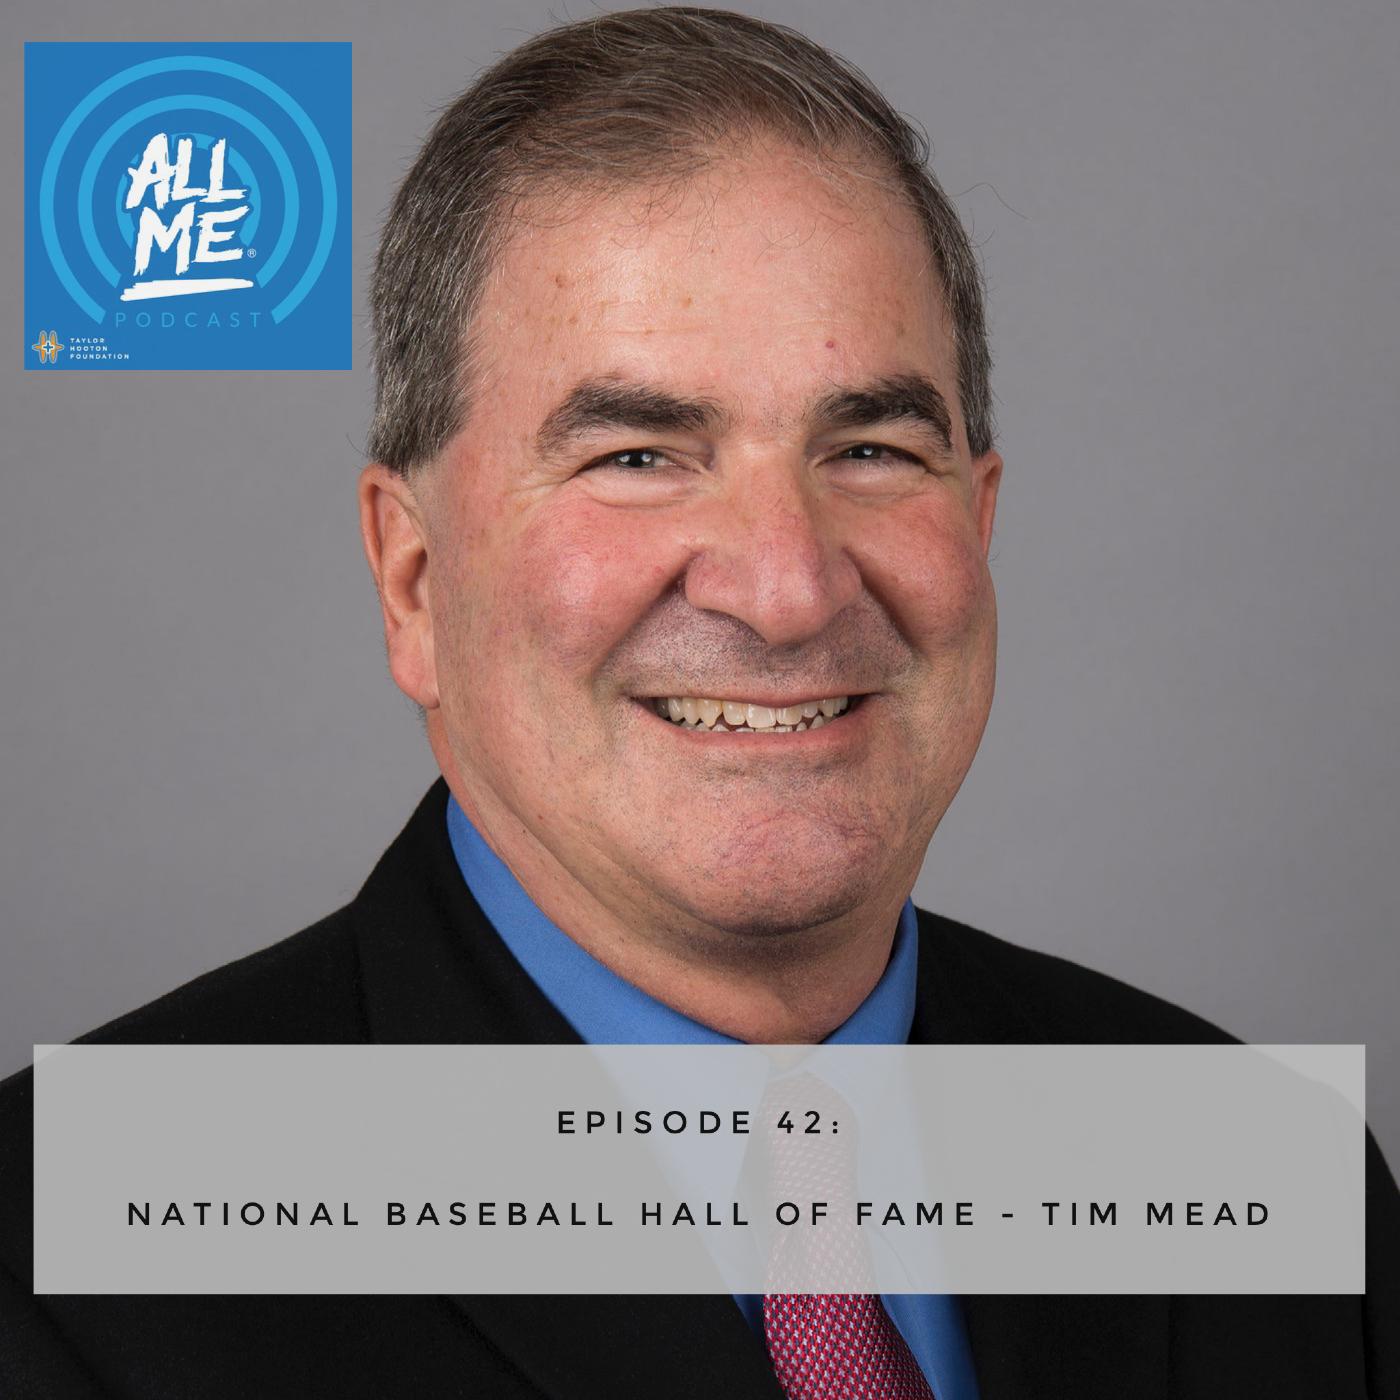 Episode 42: National Baseball Hall of Fame - Tim Mead